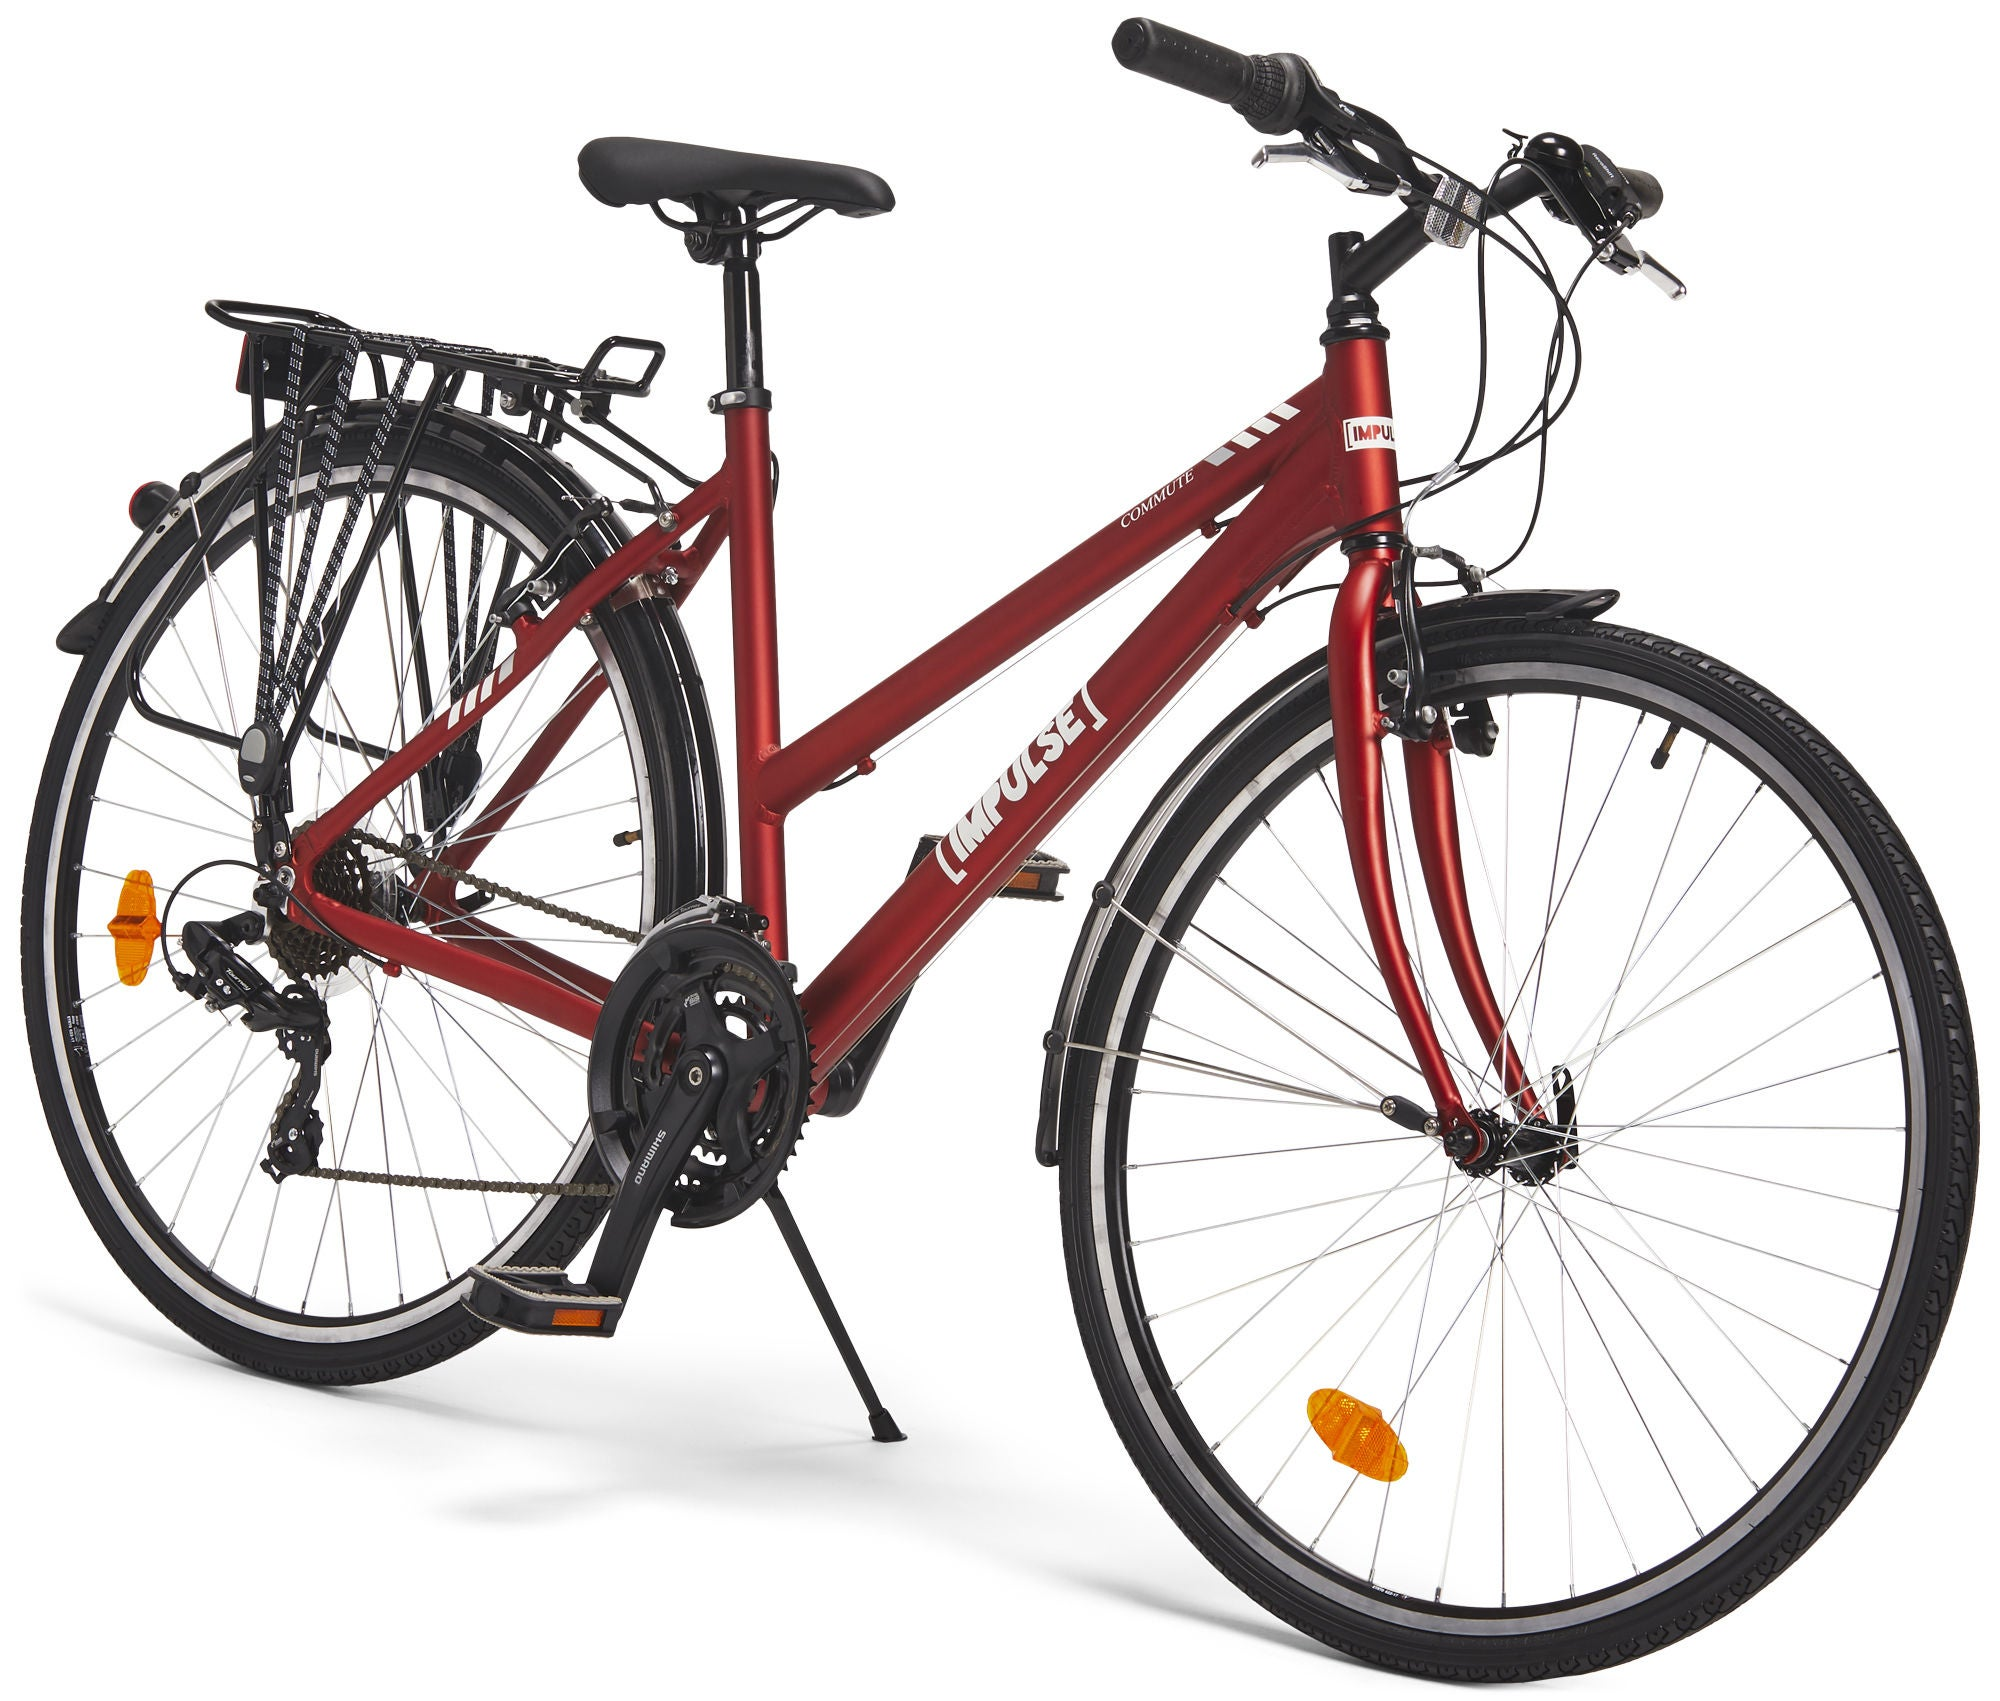 Nykomna Köp Impulse Premium Commute Cykel 28 tum, Red | Jollyroom BC-72